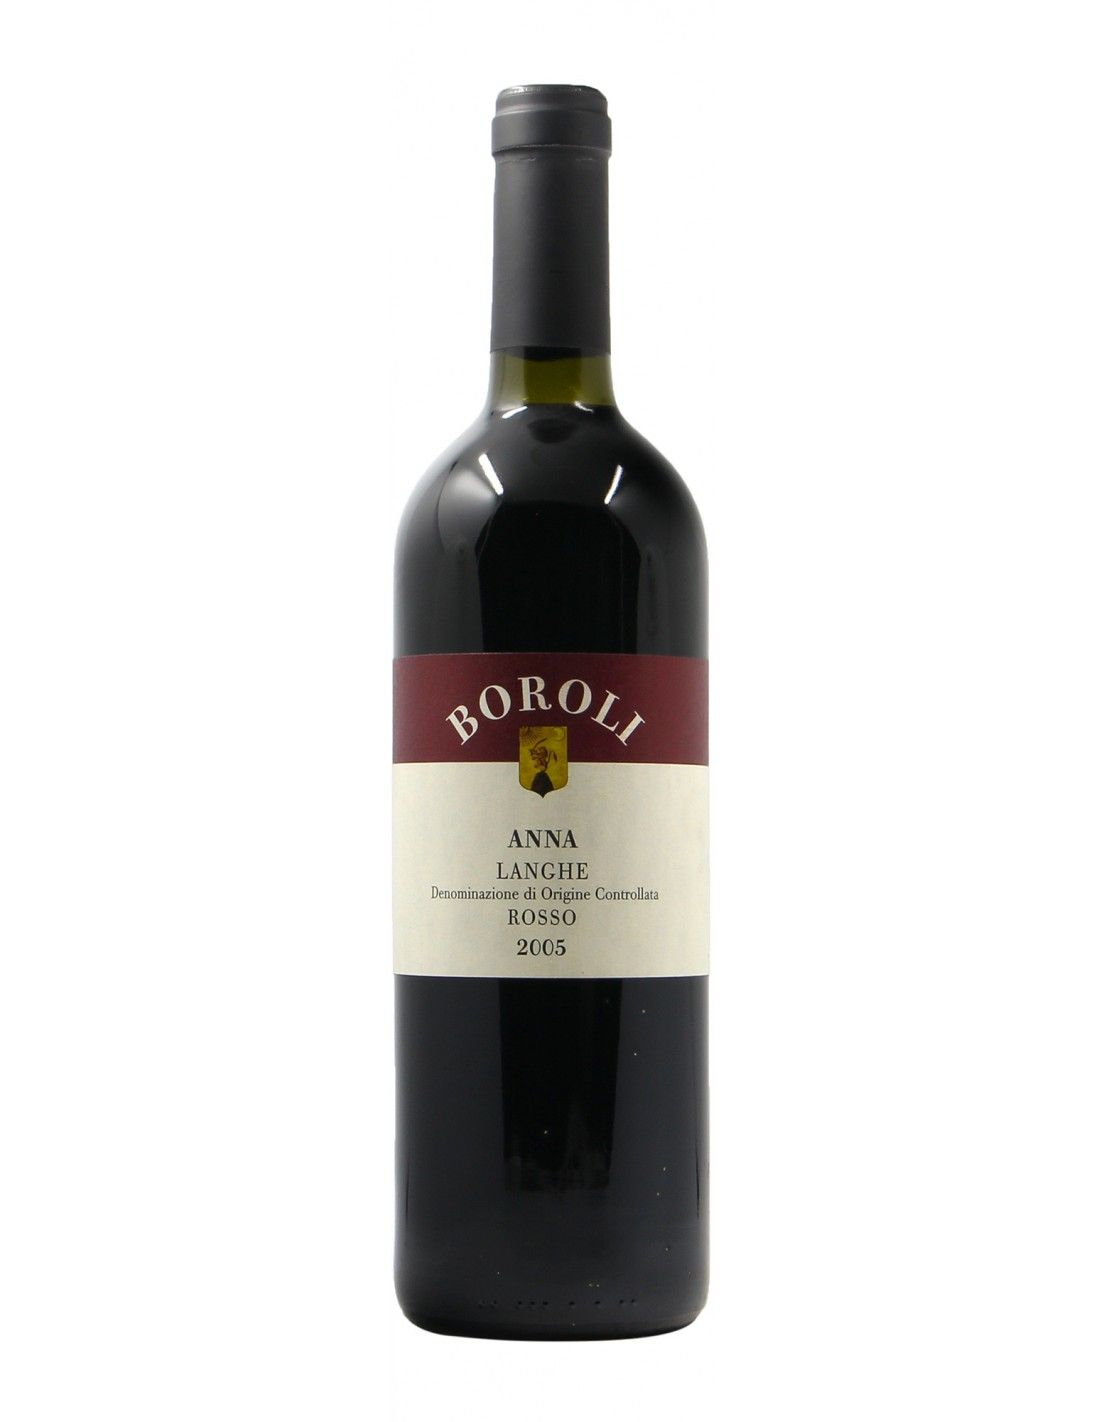 LANGHE ROSSO ANNA 2005 BOROLI Grandi Bottiglie